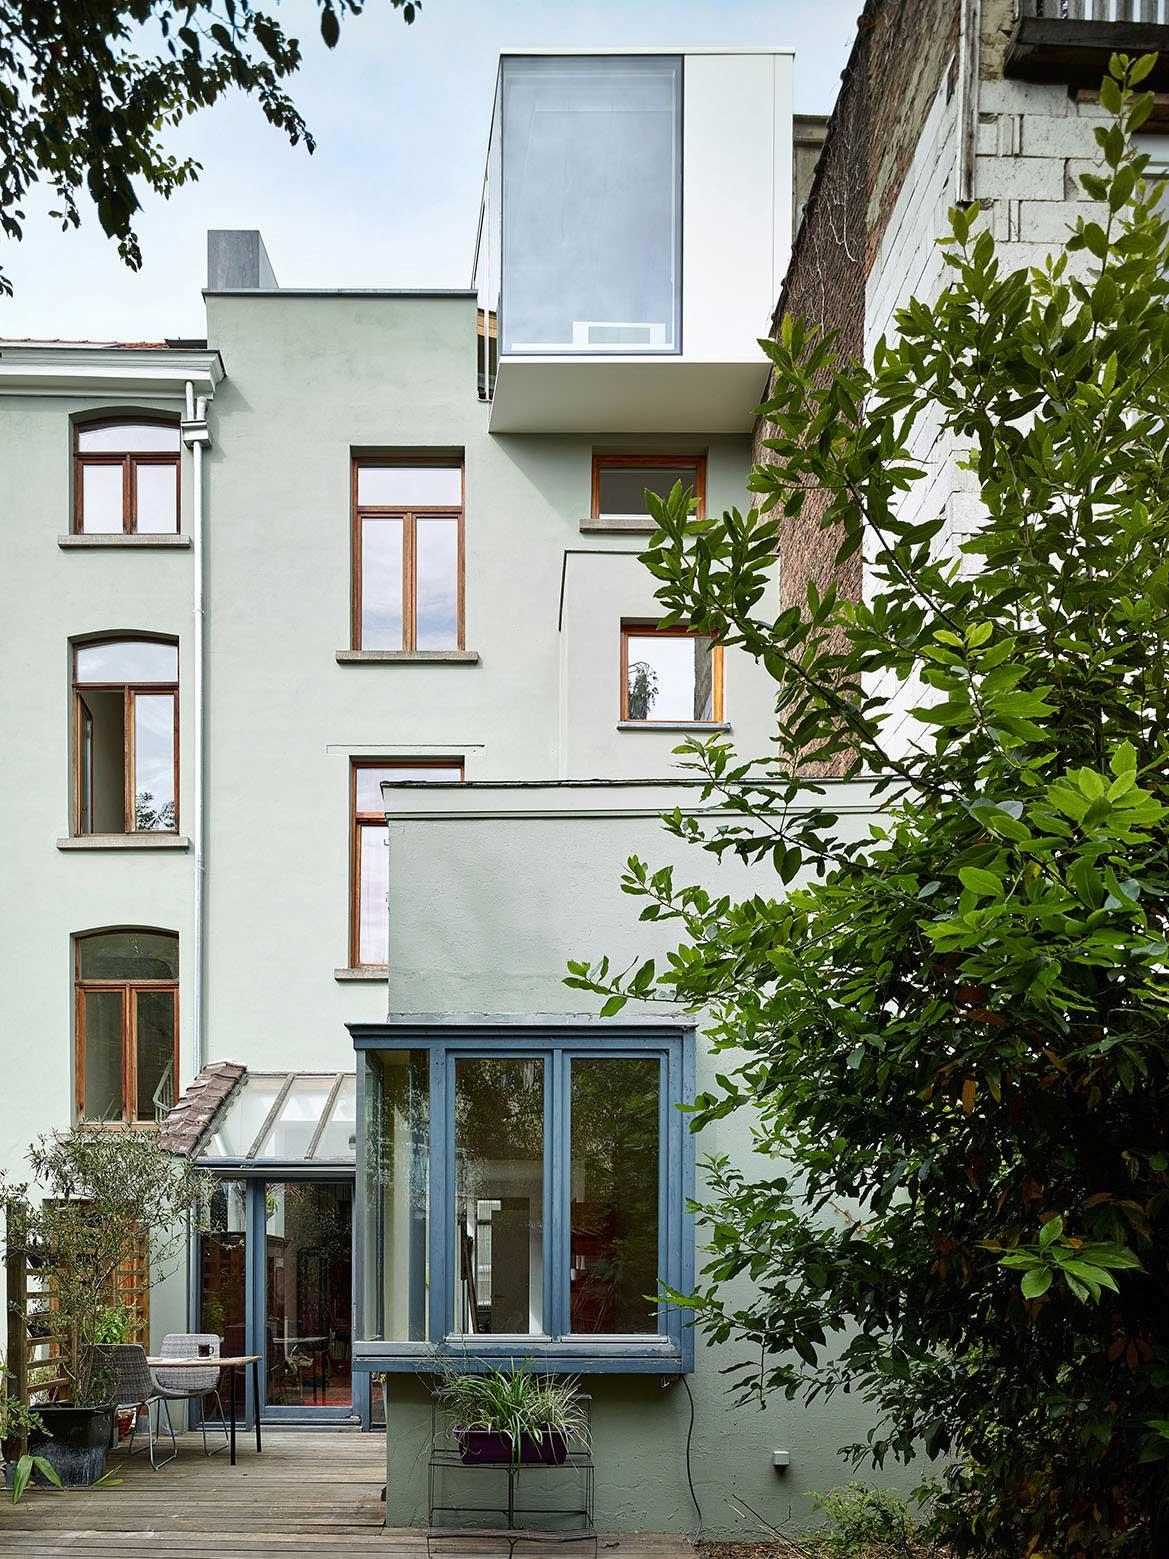 Dual Occupancy Terrace House by Edouard Brunet + François Martens | Yellowtrace